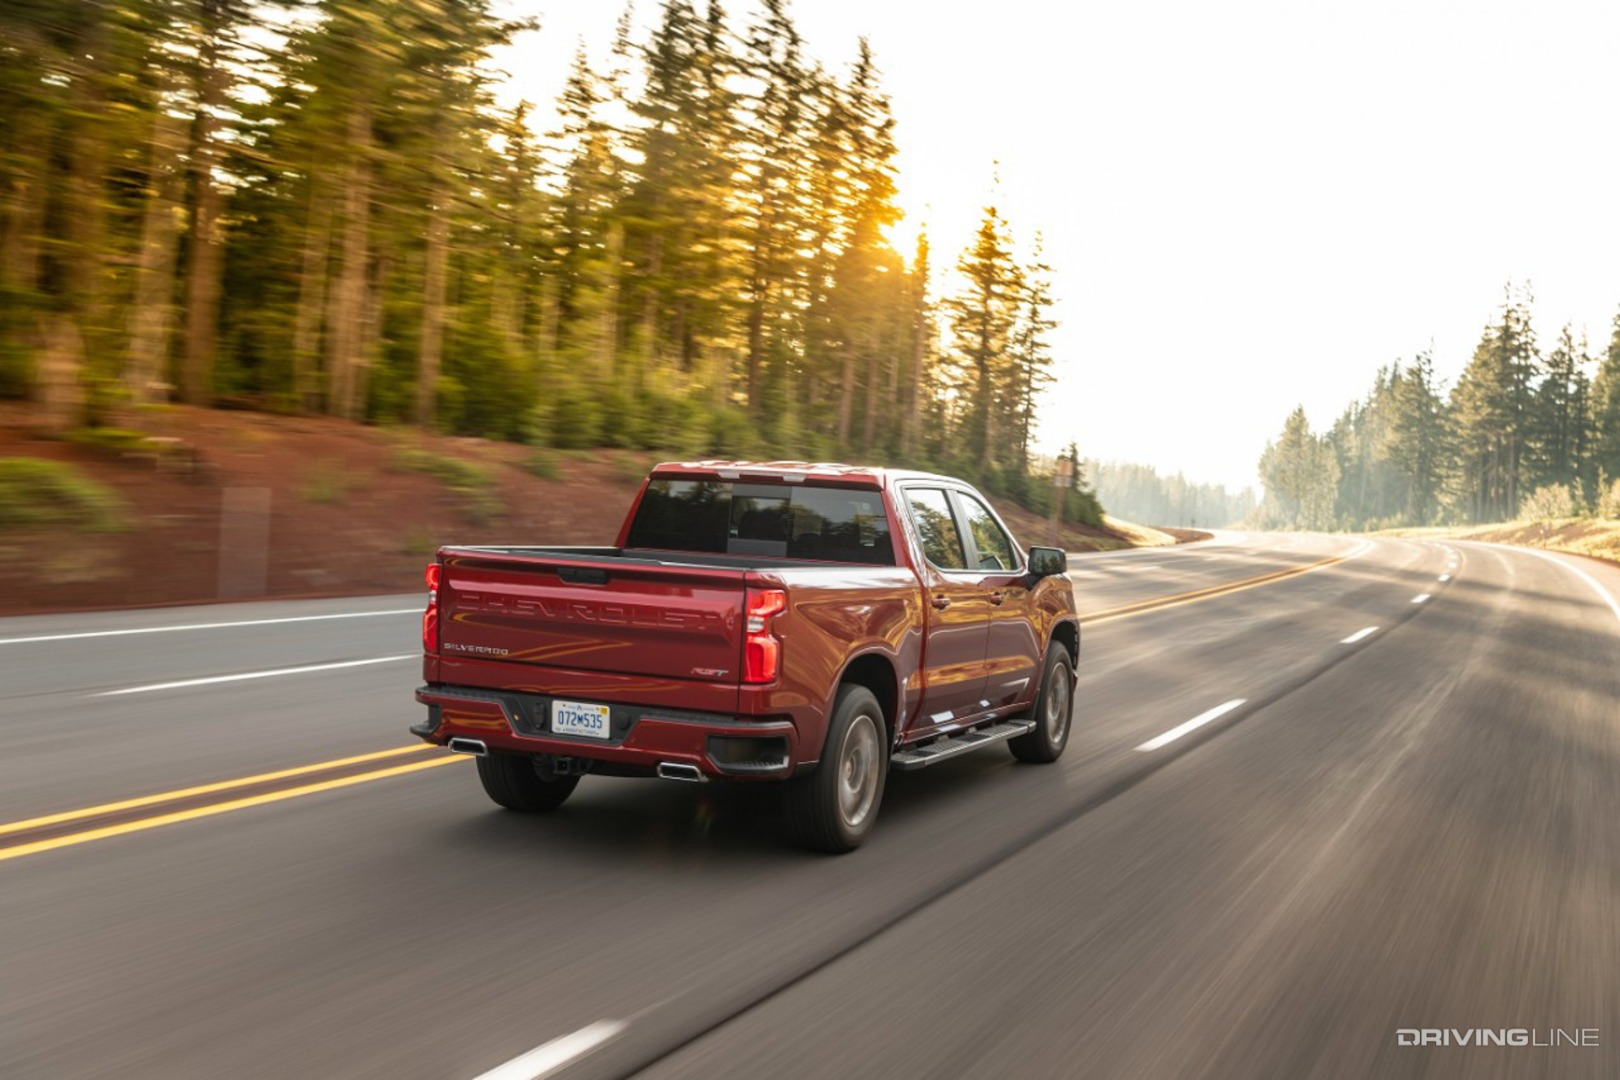 Chevy Silverado: New 3.0L Duramax Diesel | DrivingLine